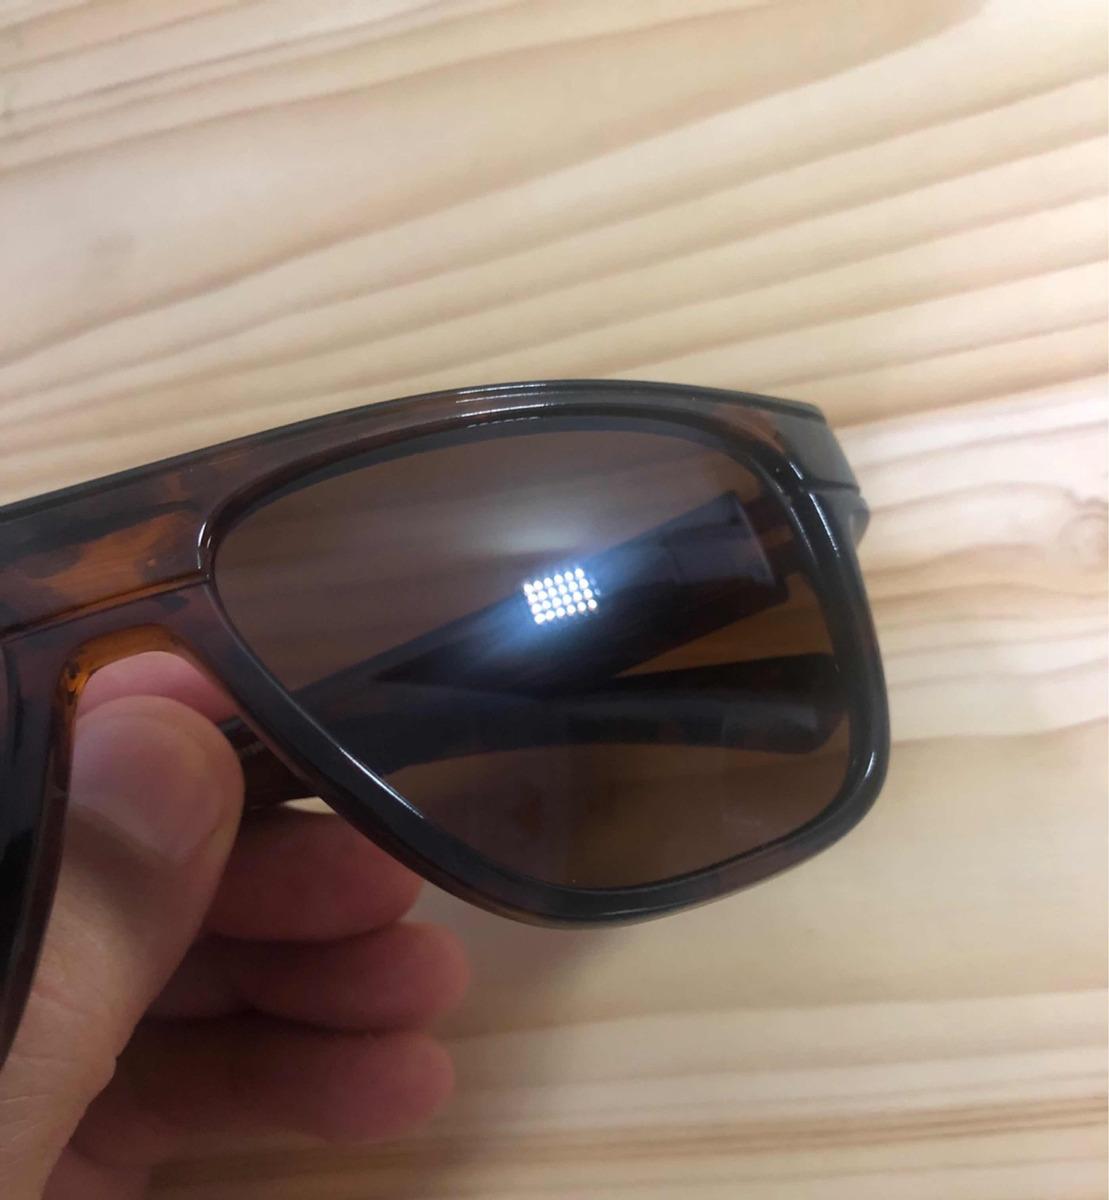 cc7a307b3f847 Óculos De Sol Edição Oakley - R  449